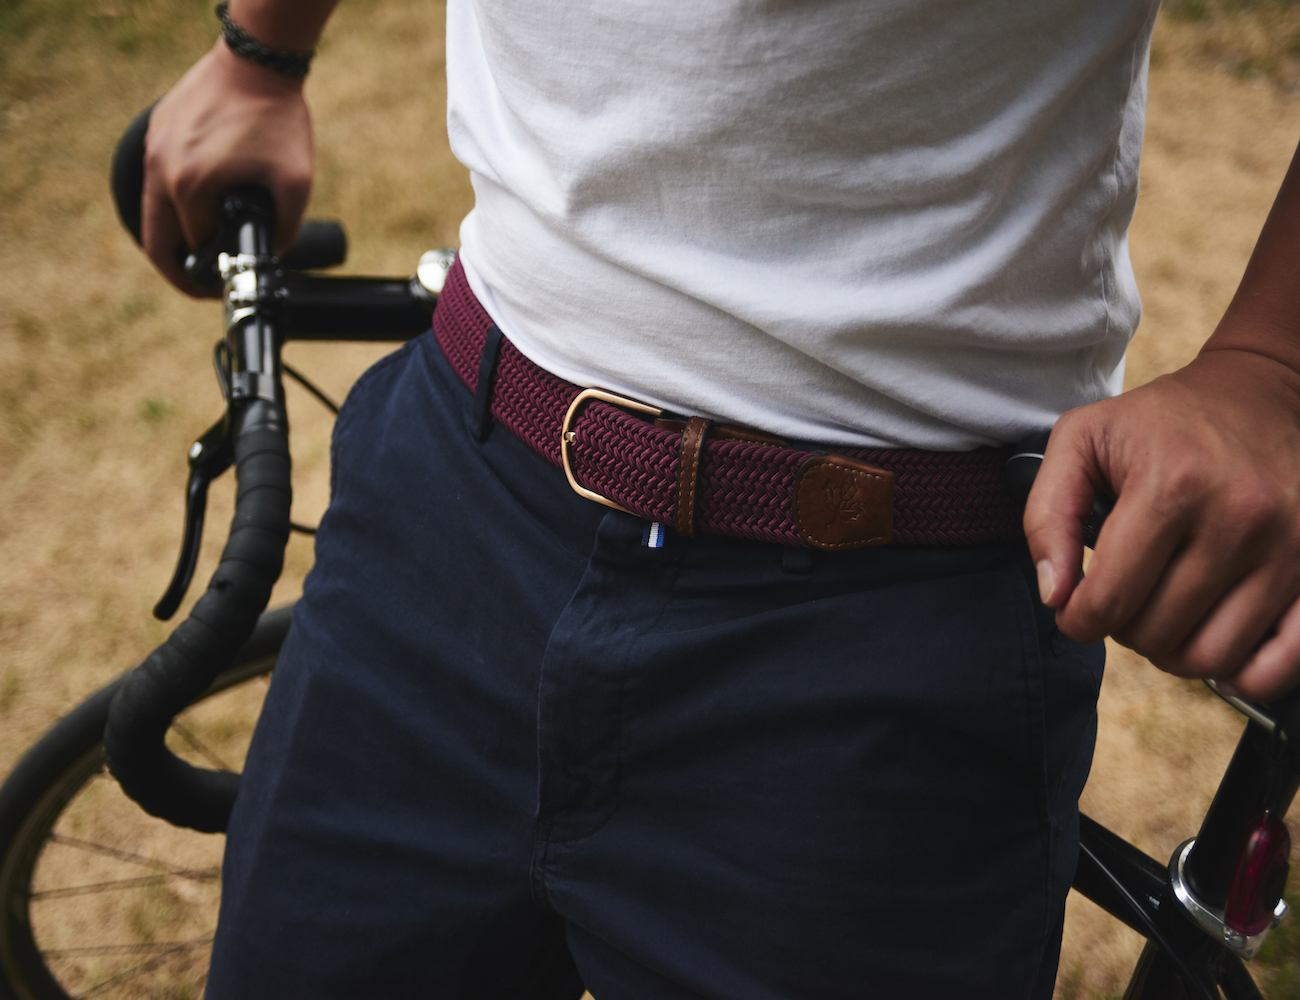 Beltline – Take it Up a Notch. Get a Better Belt.